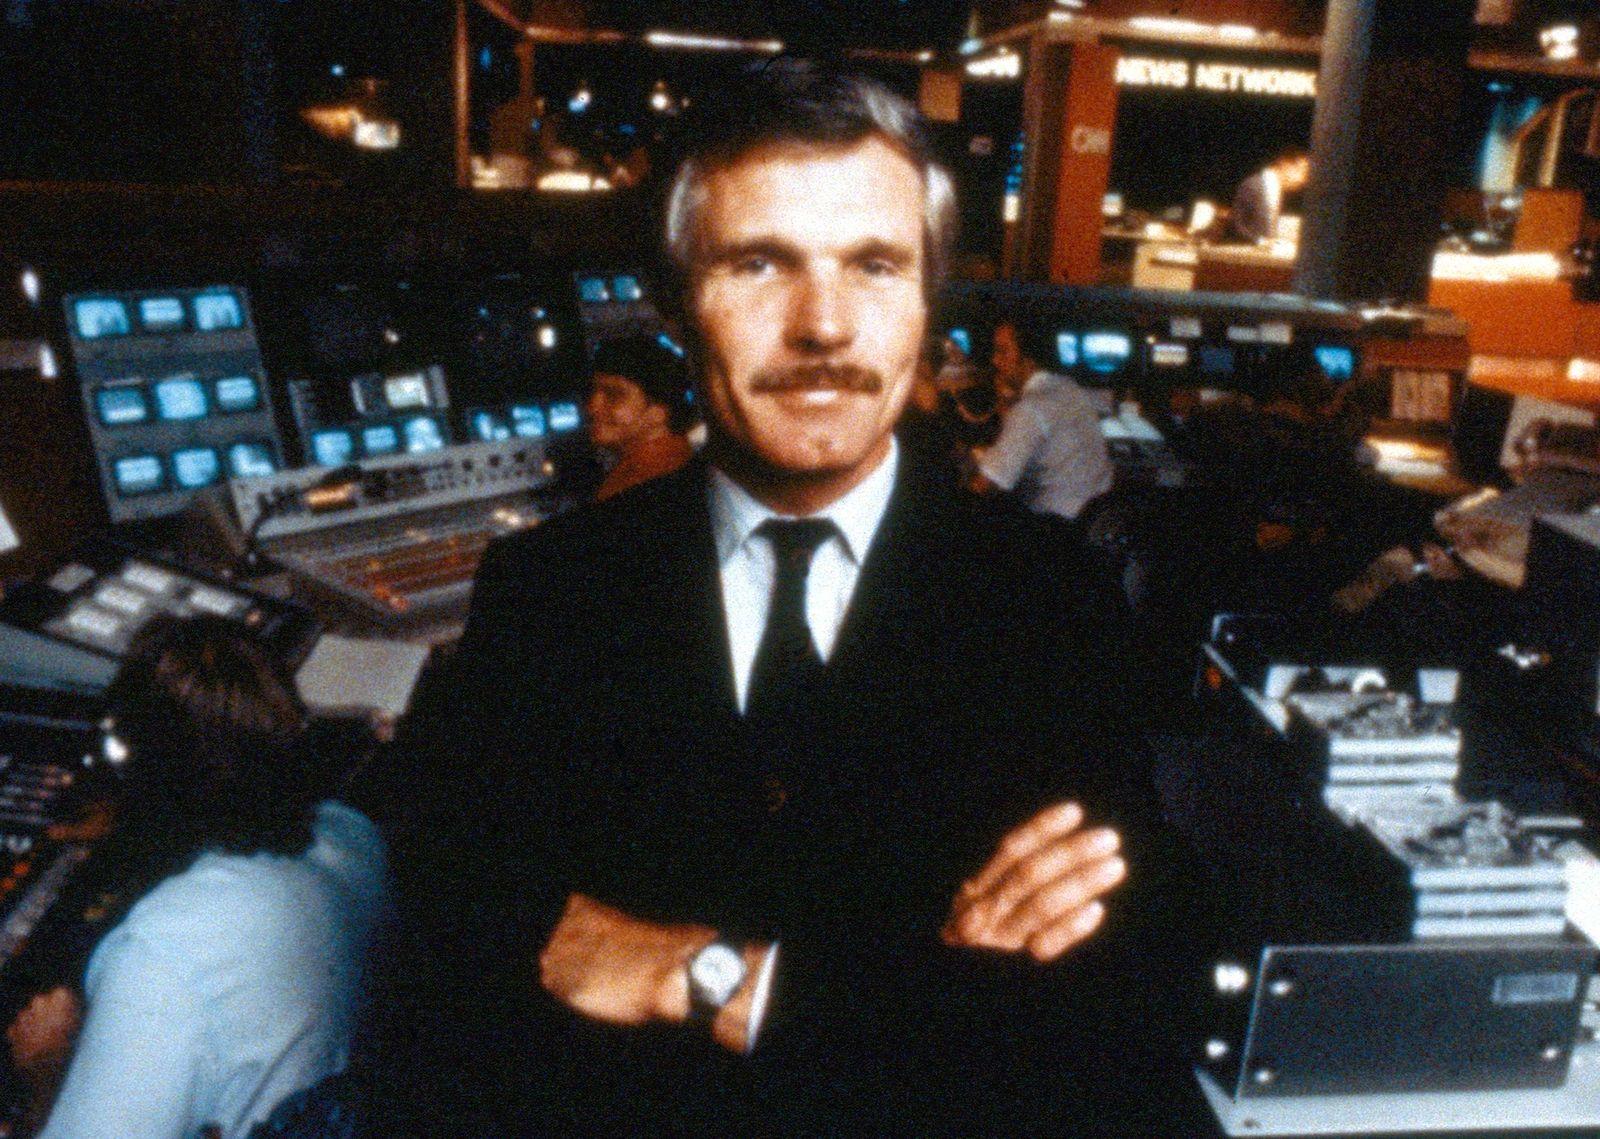 TV/ Ted Turner Doomsday Video/ CNN